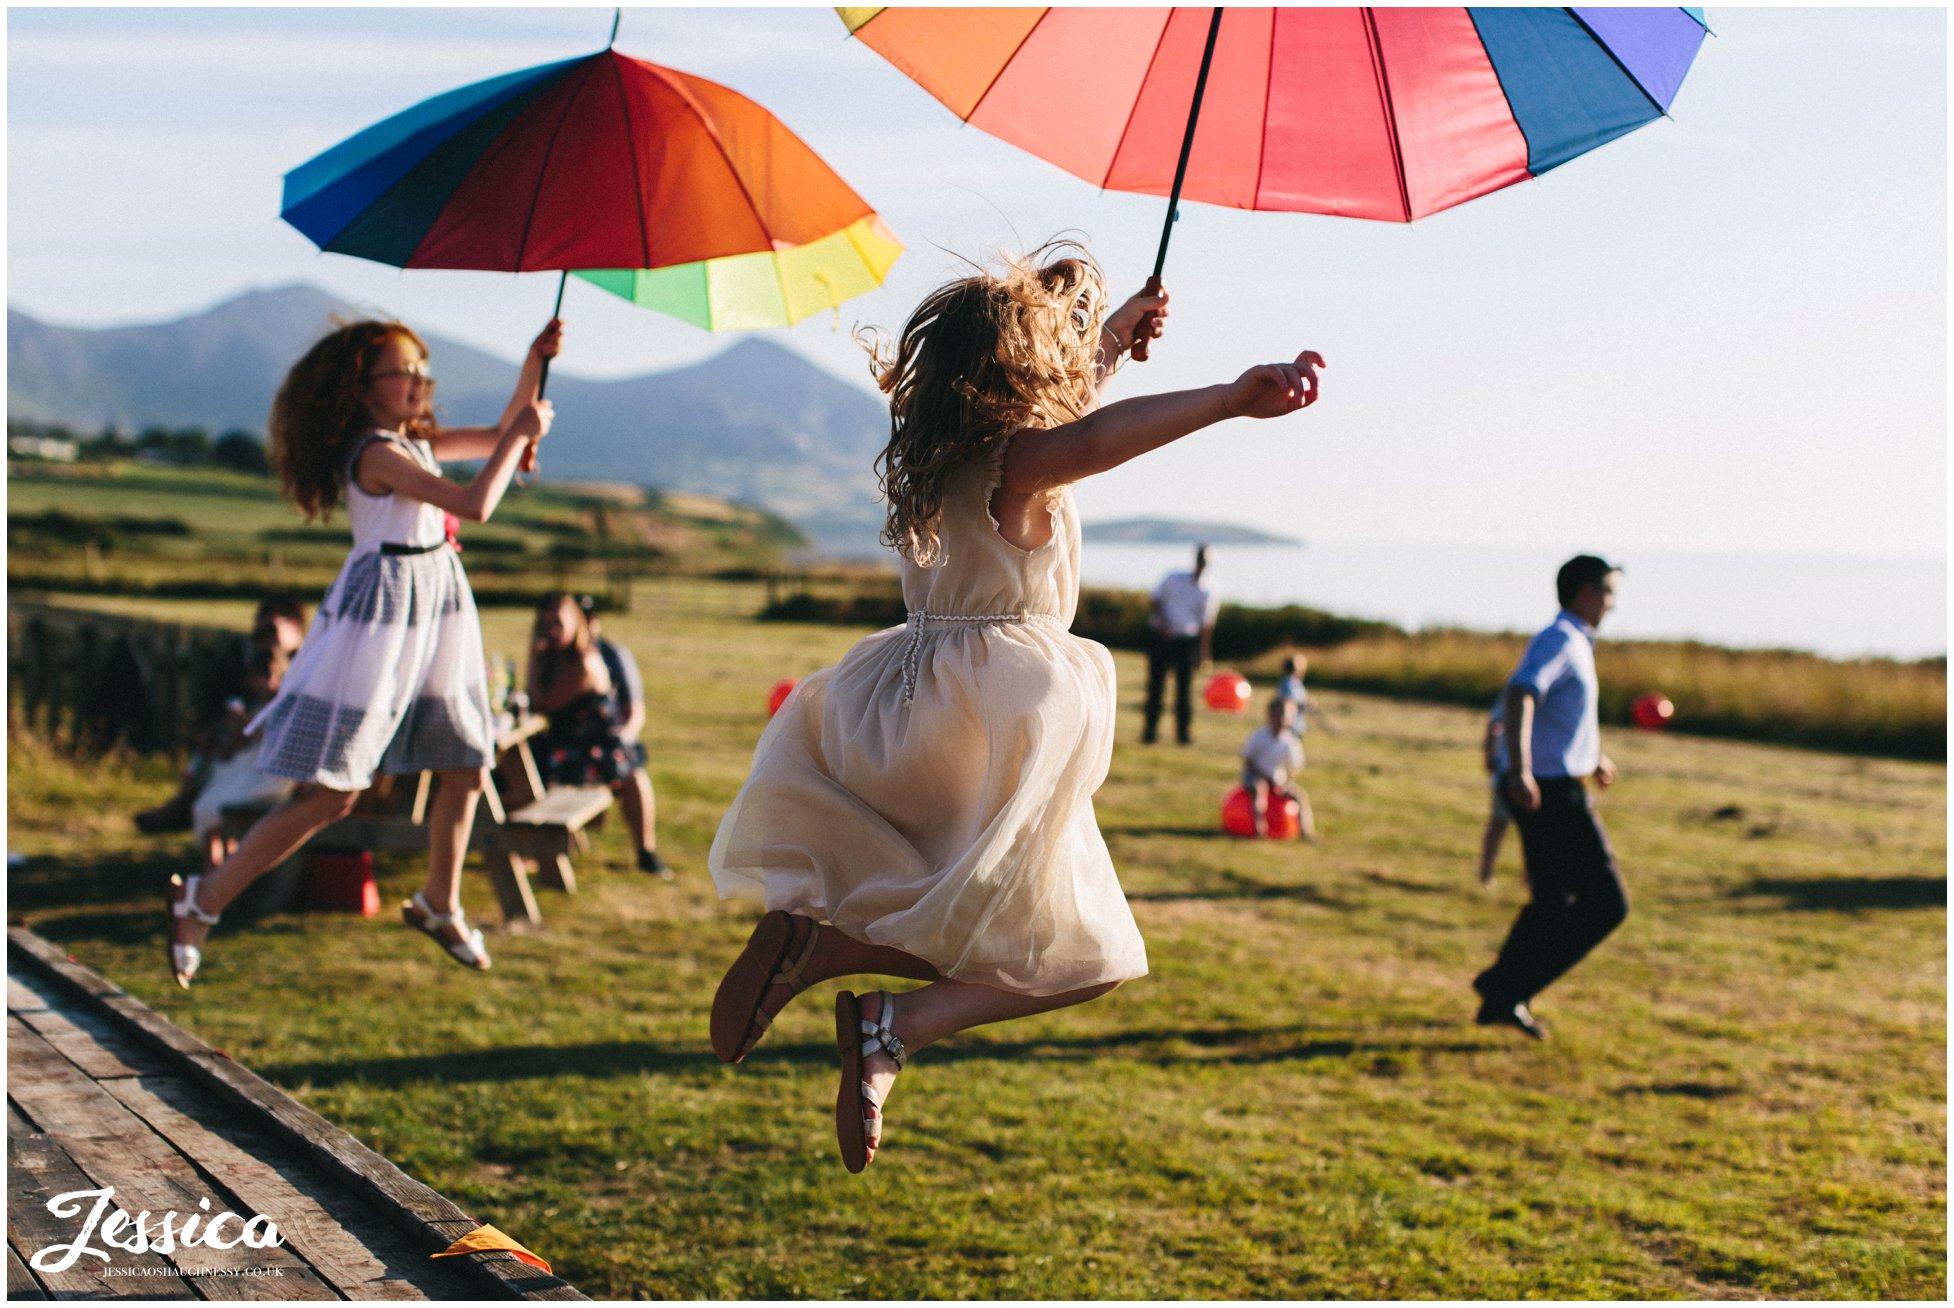 children jump off trailer with rainbow balloons